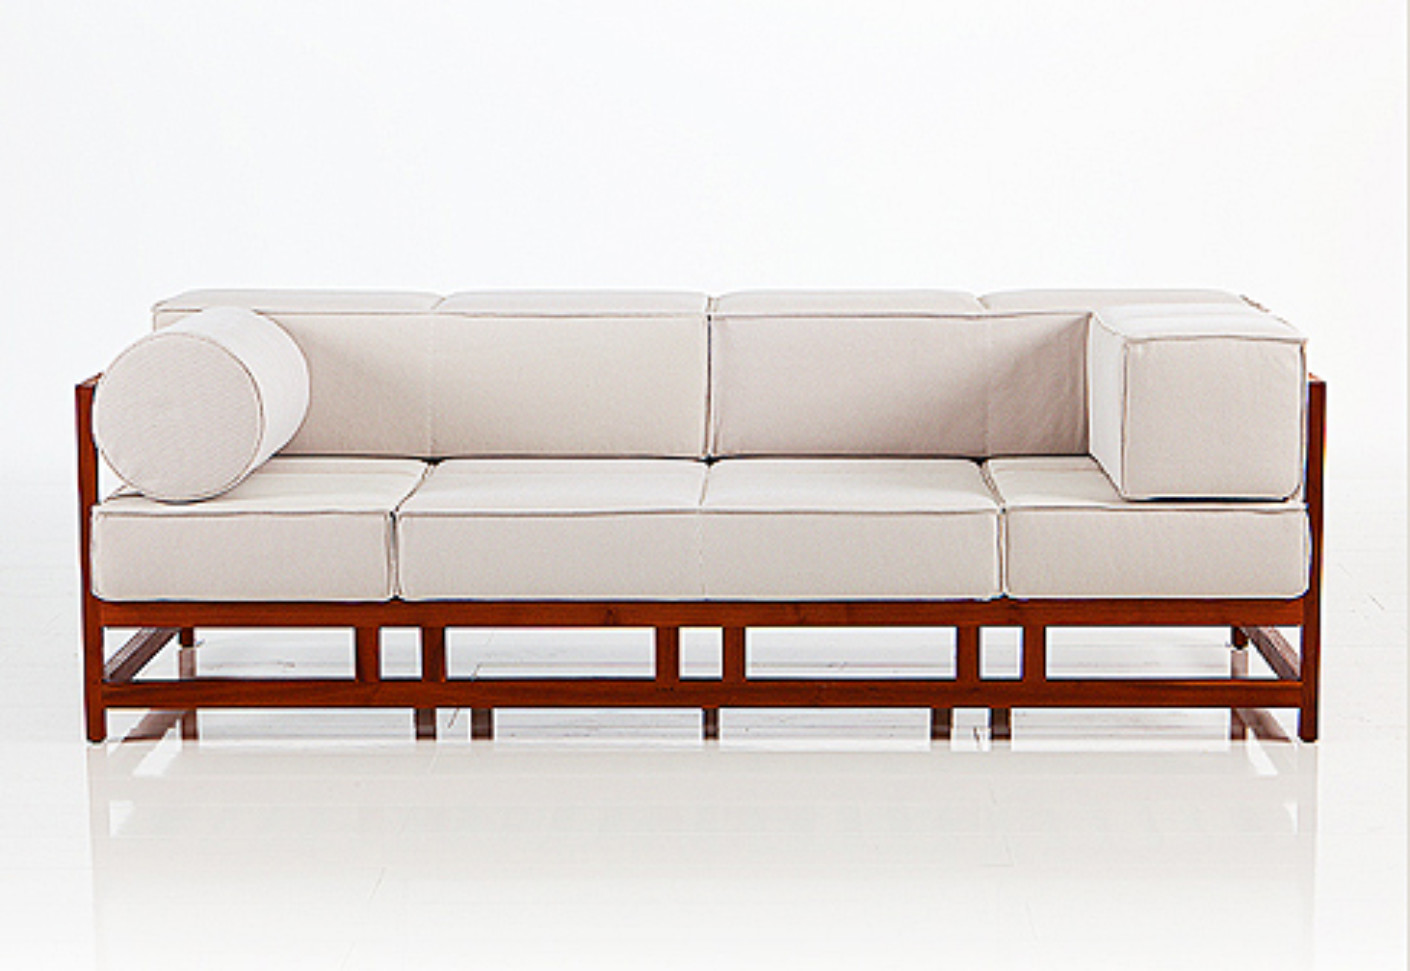 Rak Buku Model Minimalis Sekat Ruangan Seri Jakarta as well Sofa For Two together with 70261640 additionally 8 Sofa together with Corner Sofa Cover. on ikea rp sofa